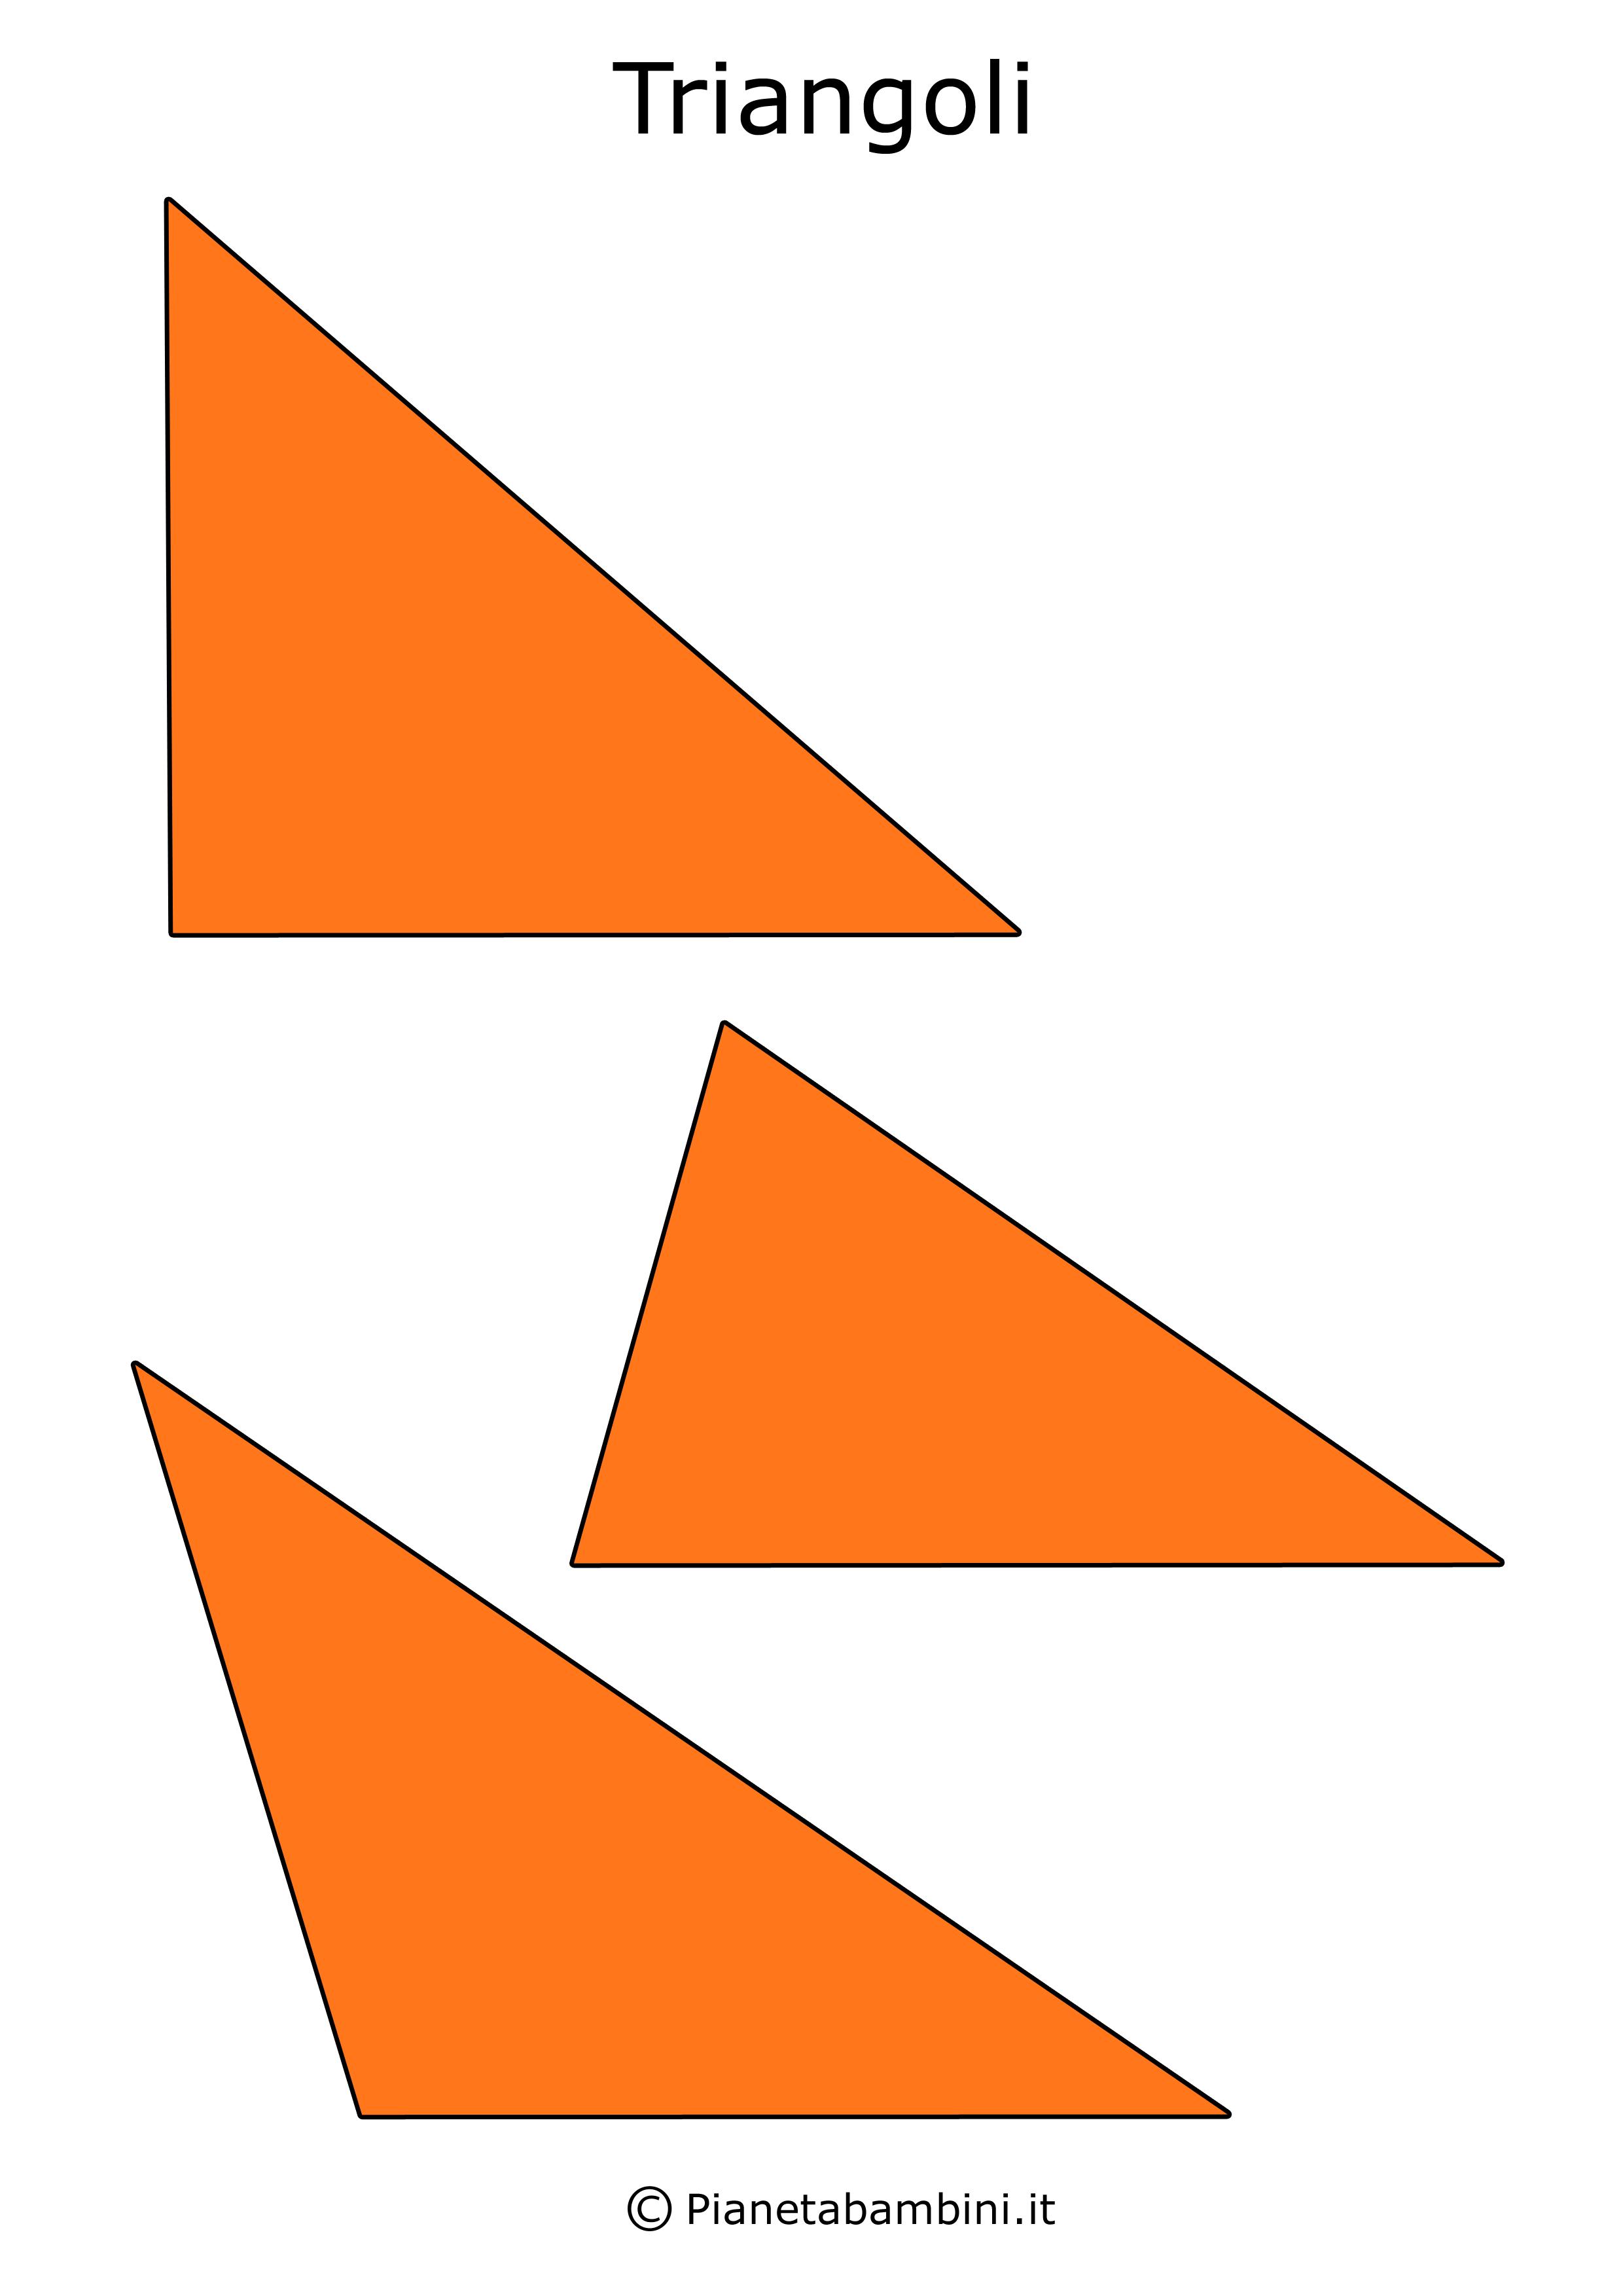 Triangoli-Semplici_2